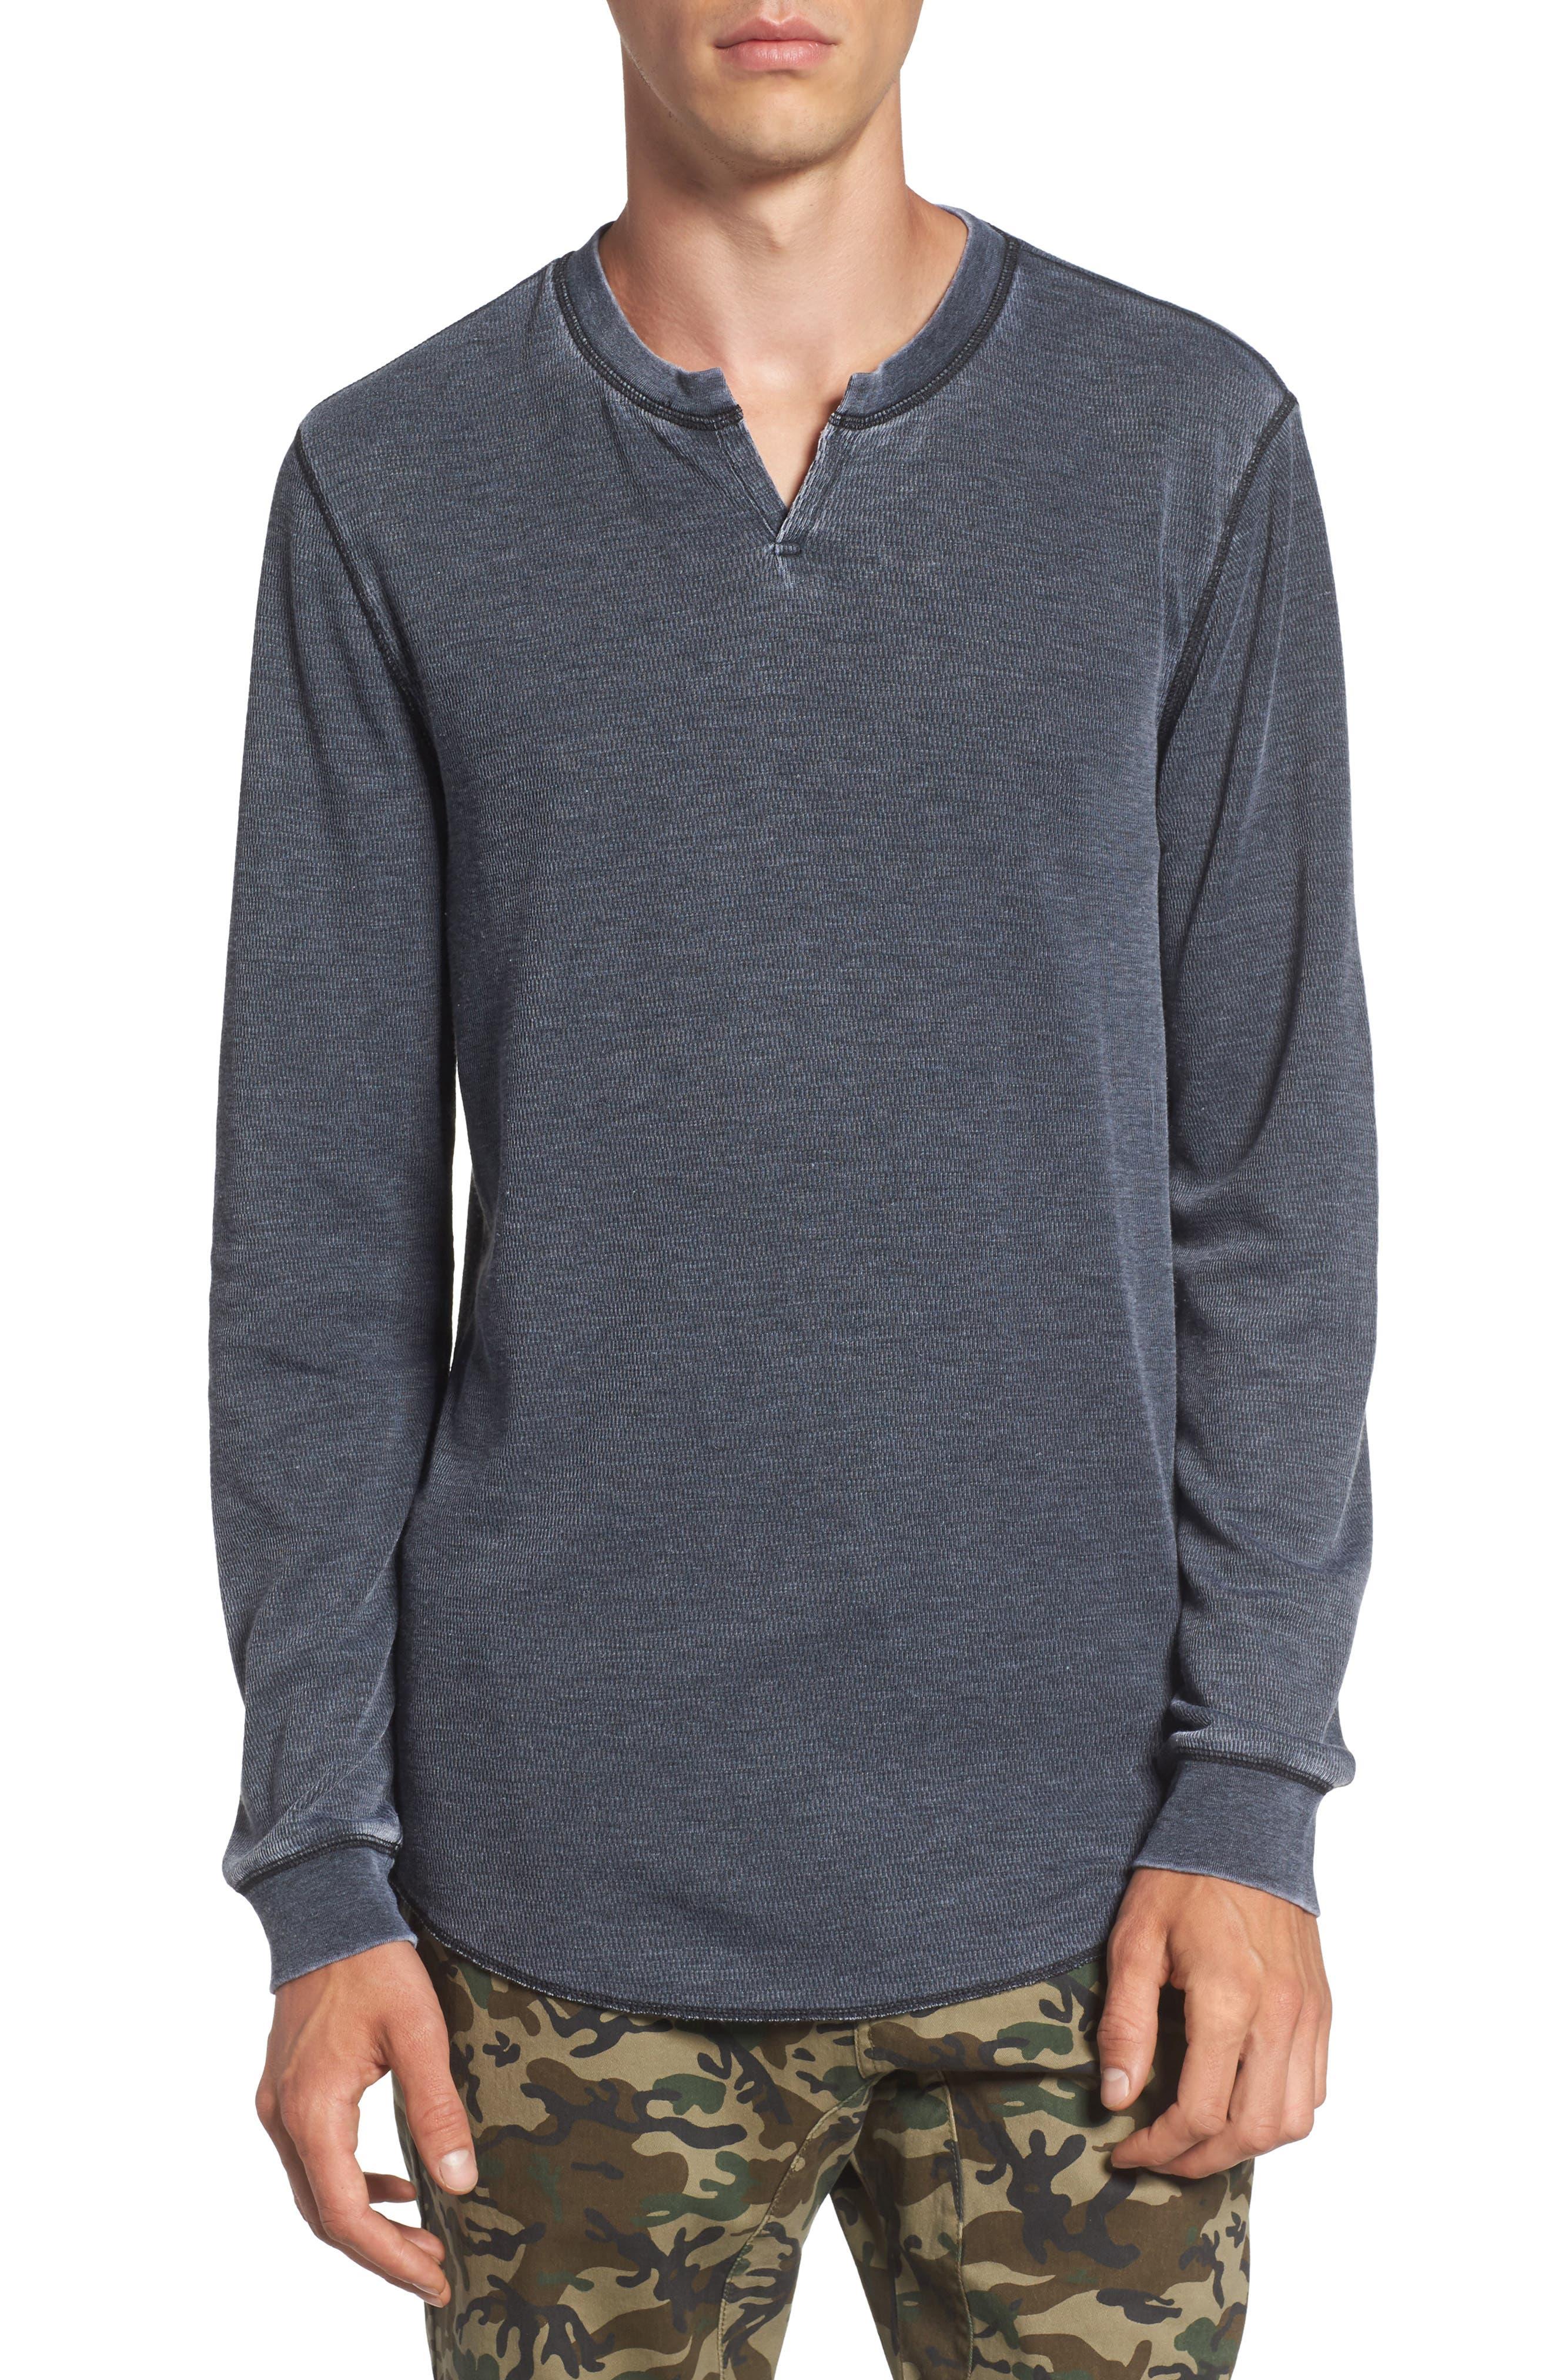 Notch Neck Thermal T-Shirt,                         Main,                         color, Black/ White Burnout